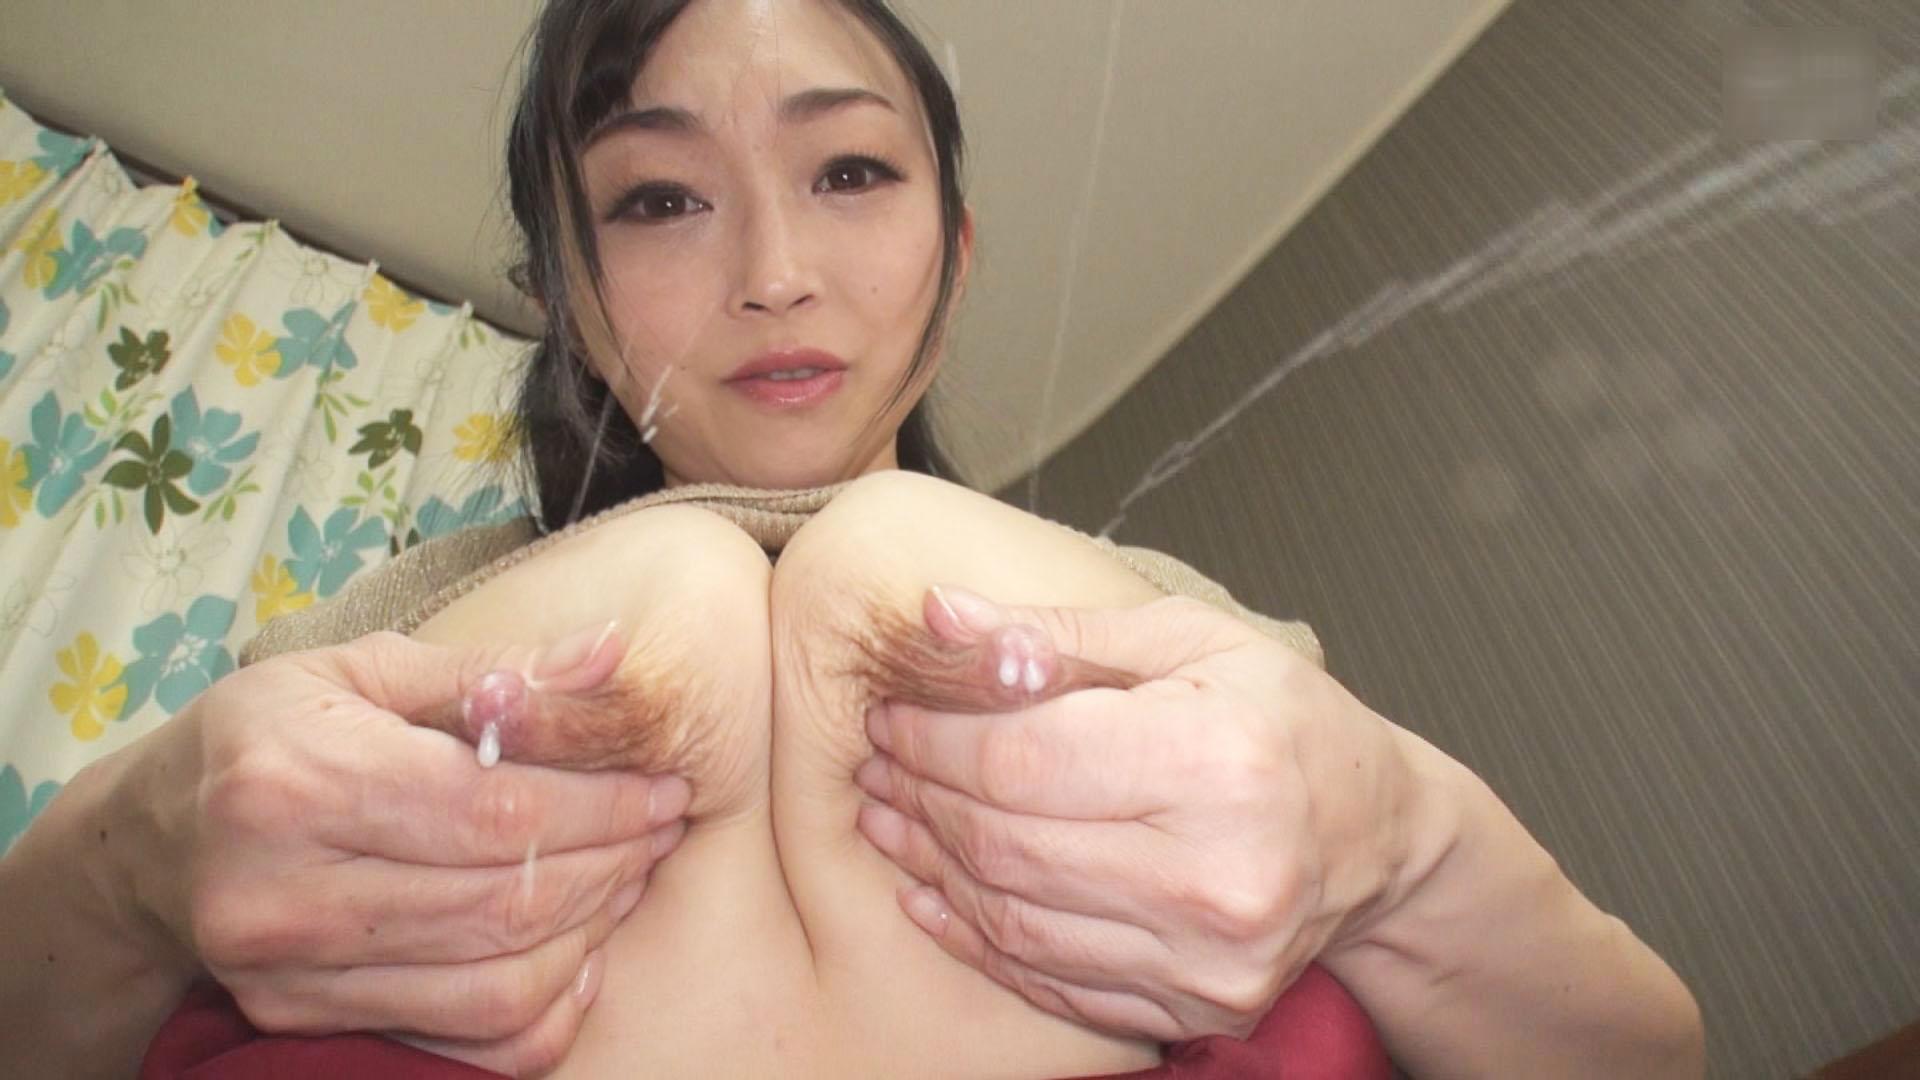 東京素人巨乳原石採掘倶楽部 vol.6 美雪(H)のサンプル画像1